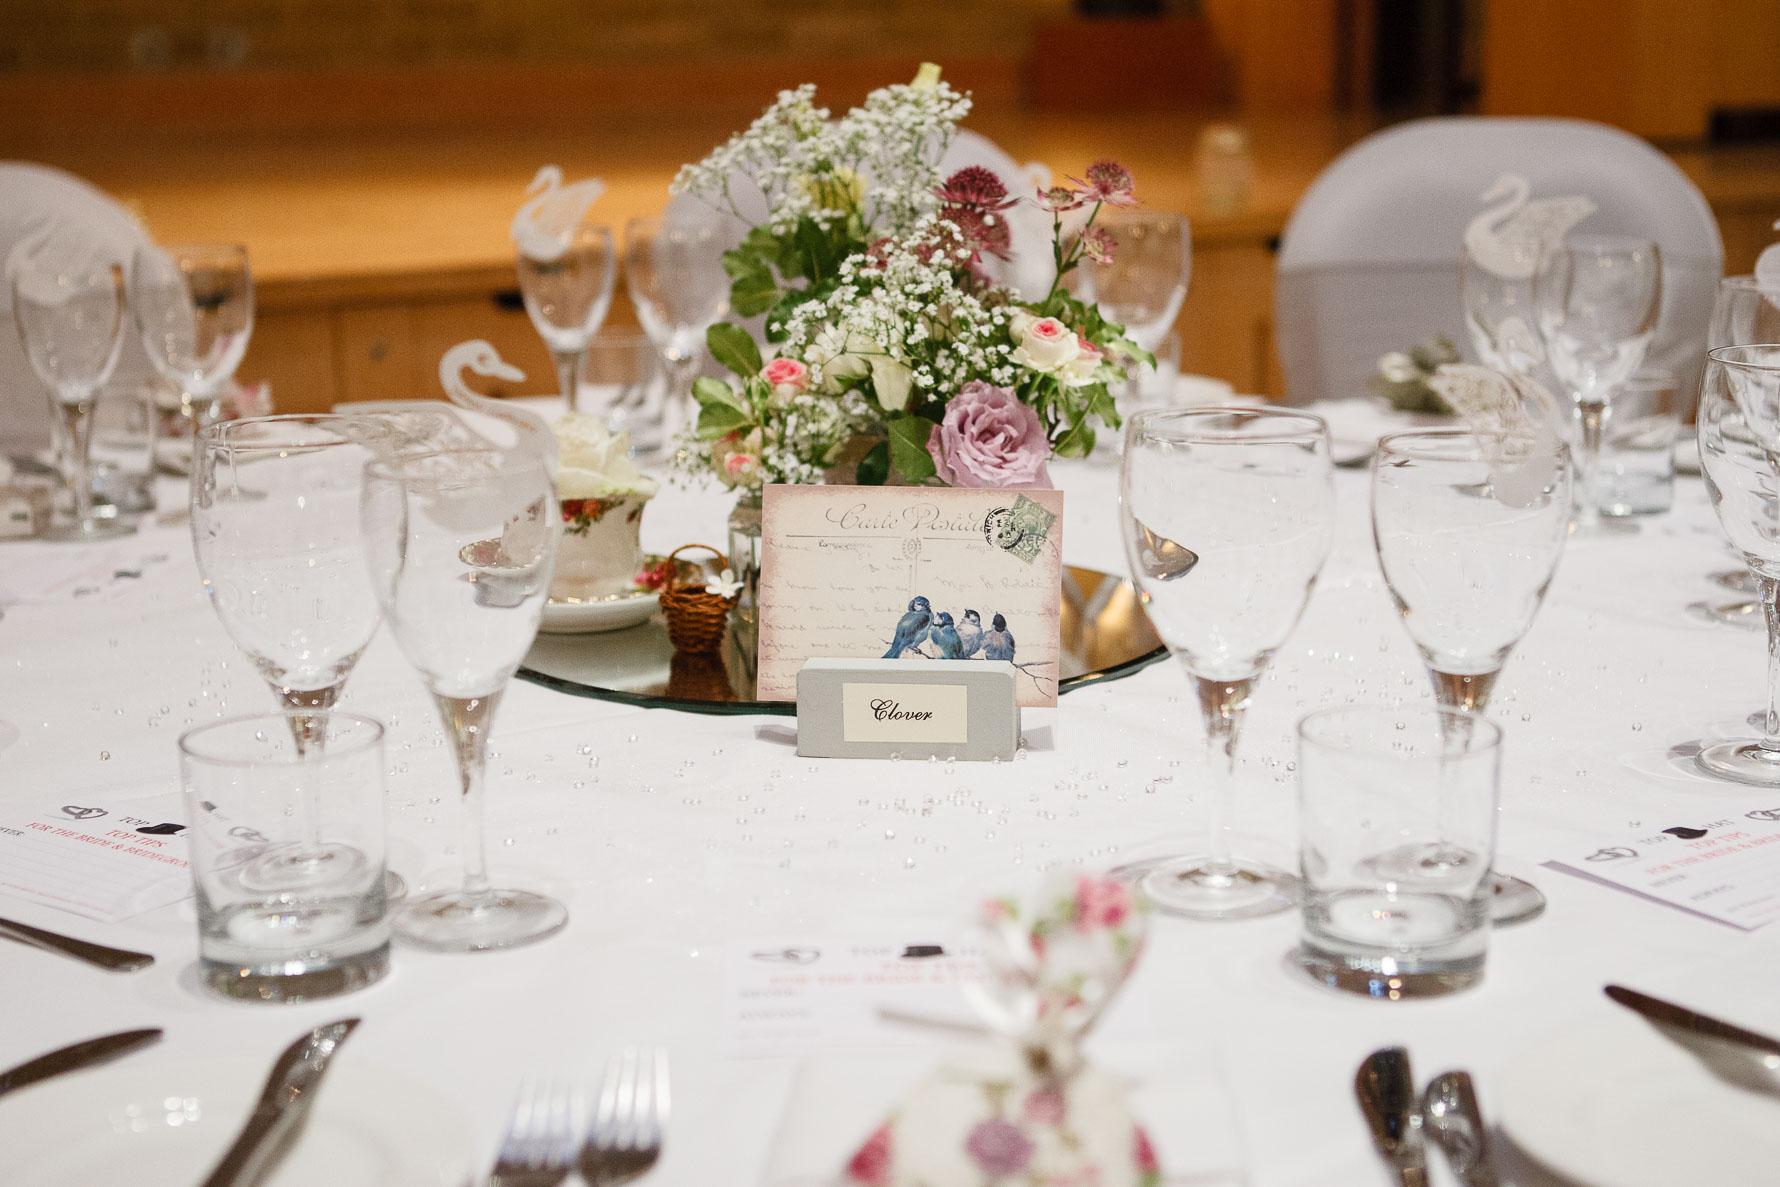 Canterbury Cathedral Lodge Wedding47-20141004 0772